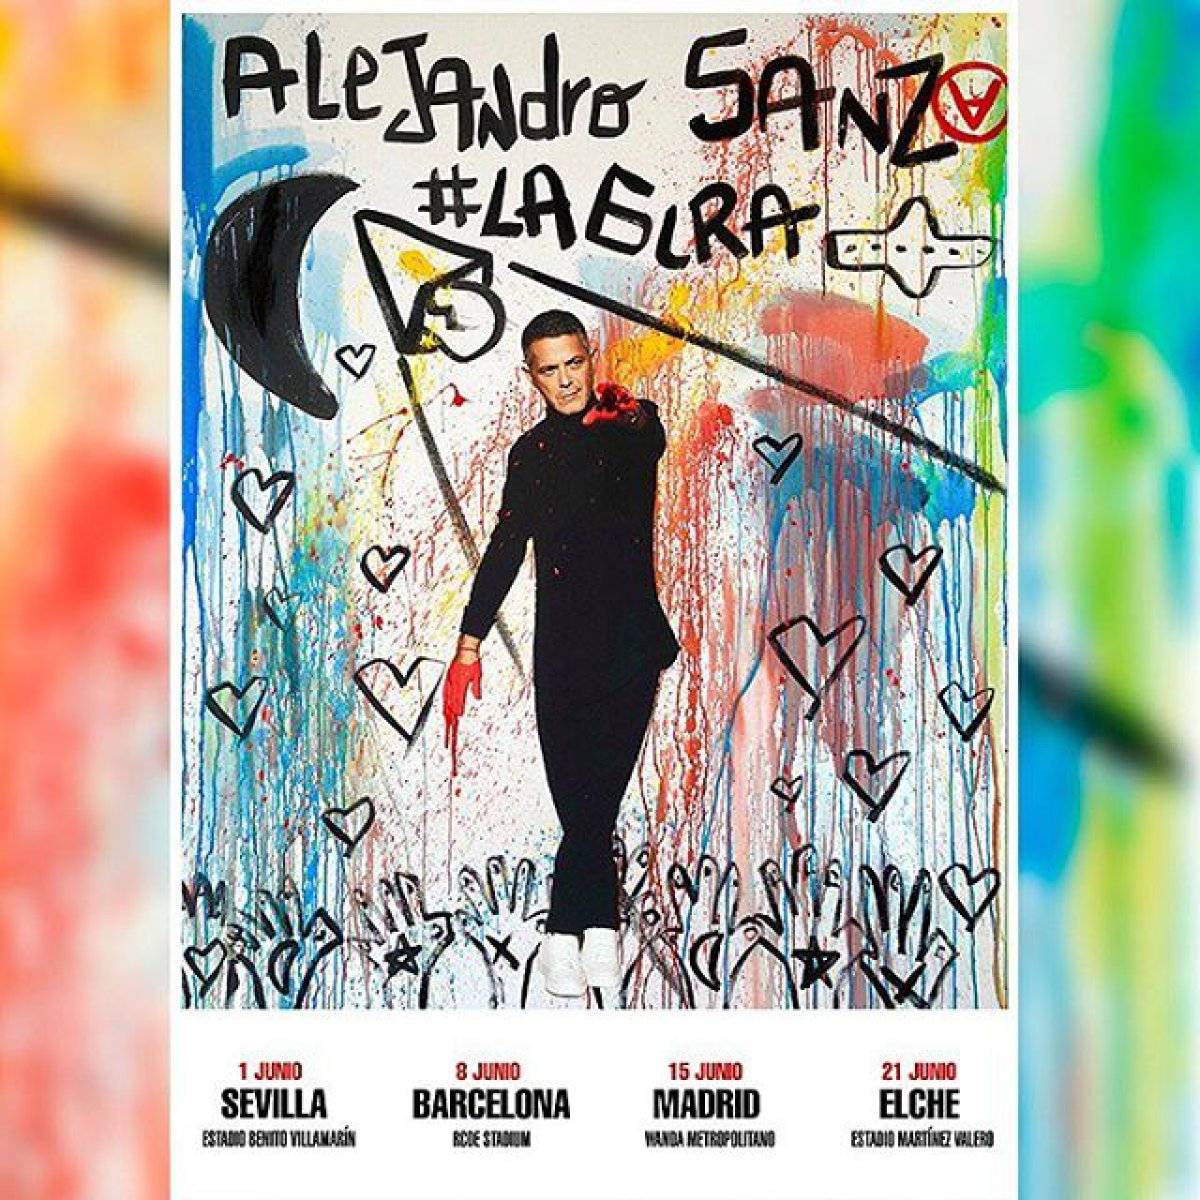 Alejandro Sanz #LaGira